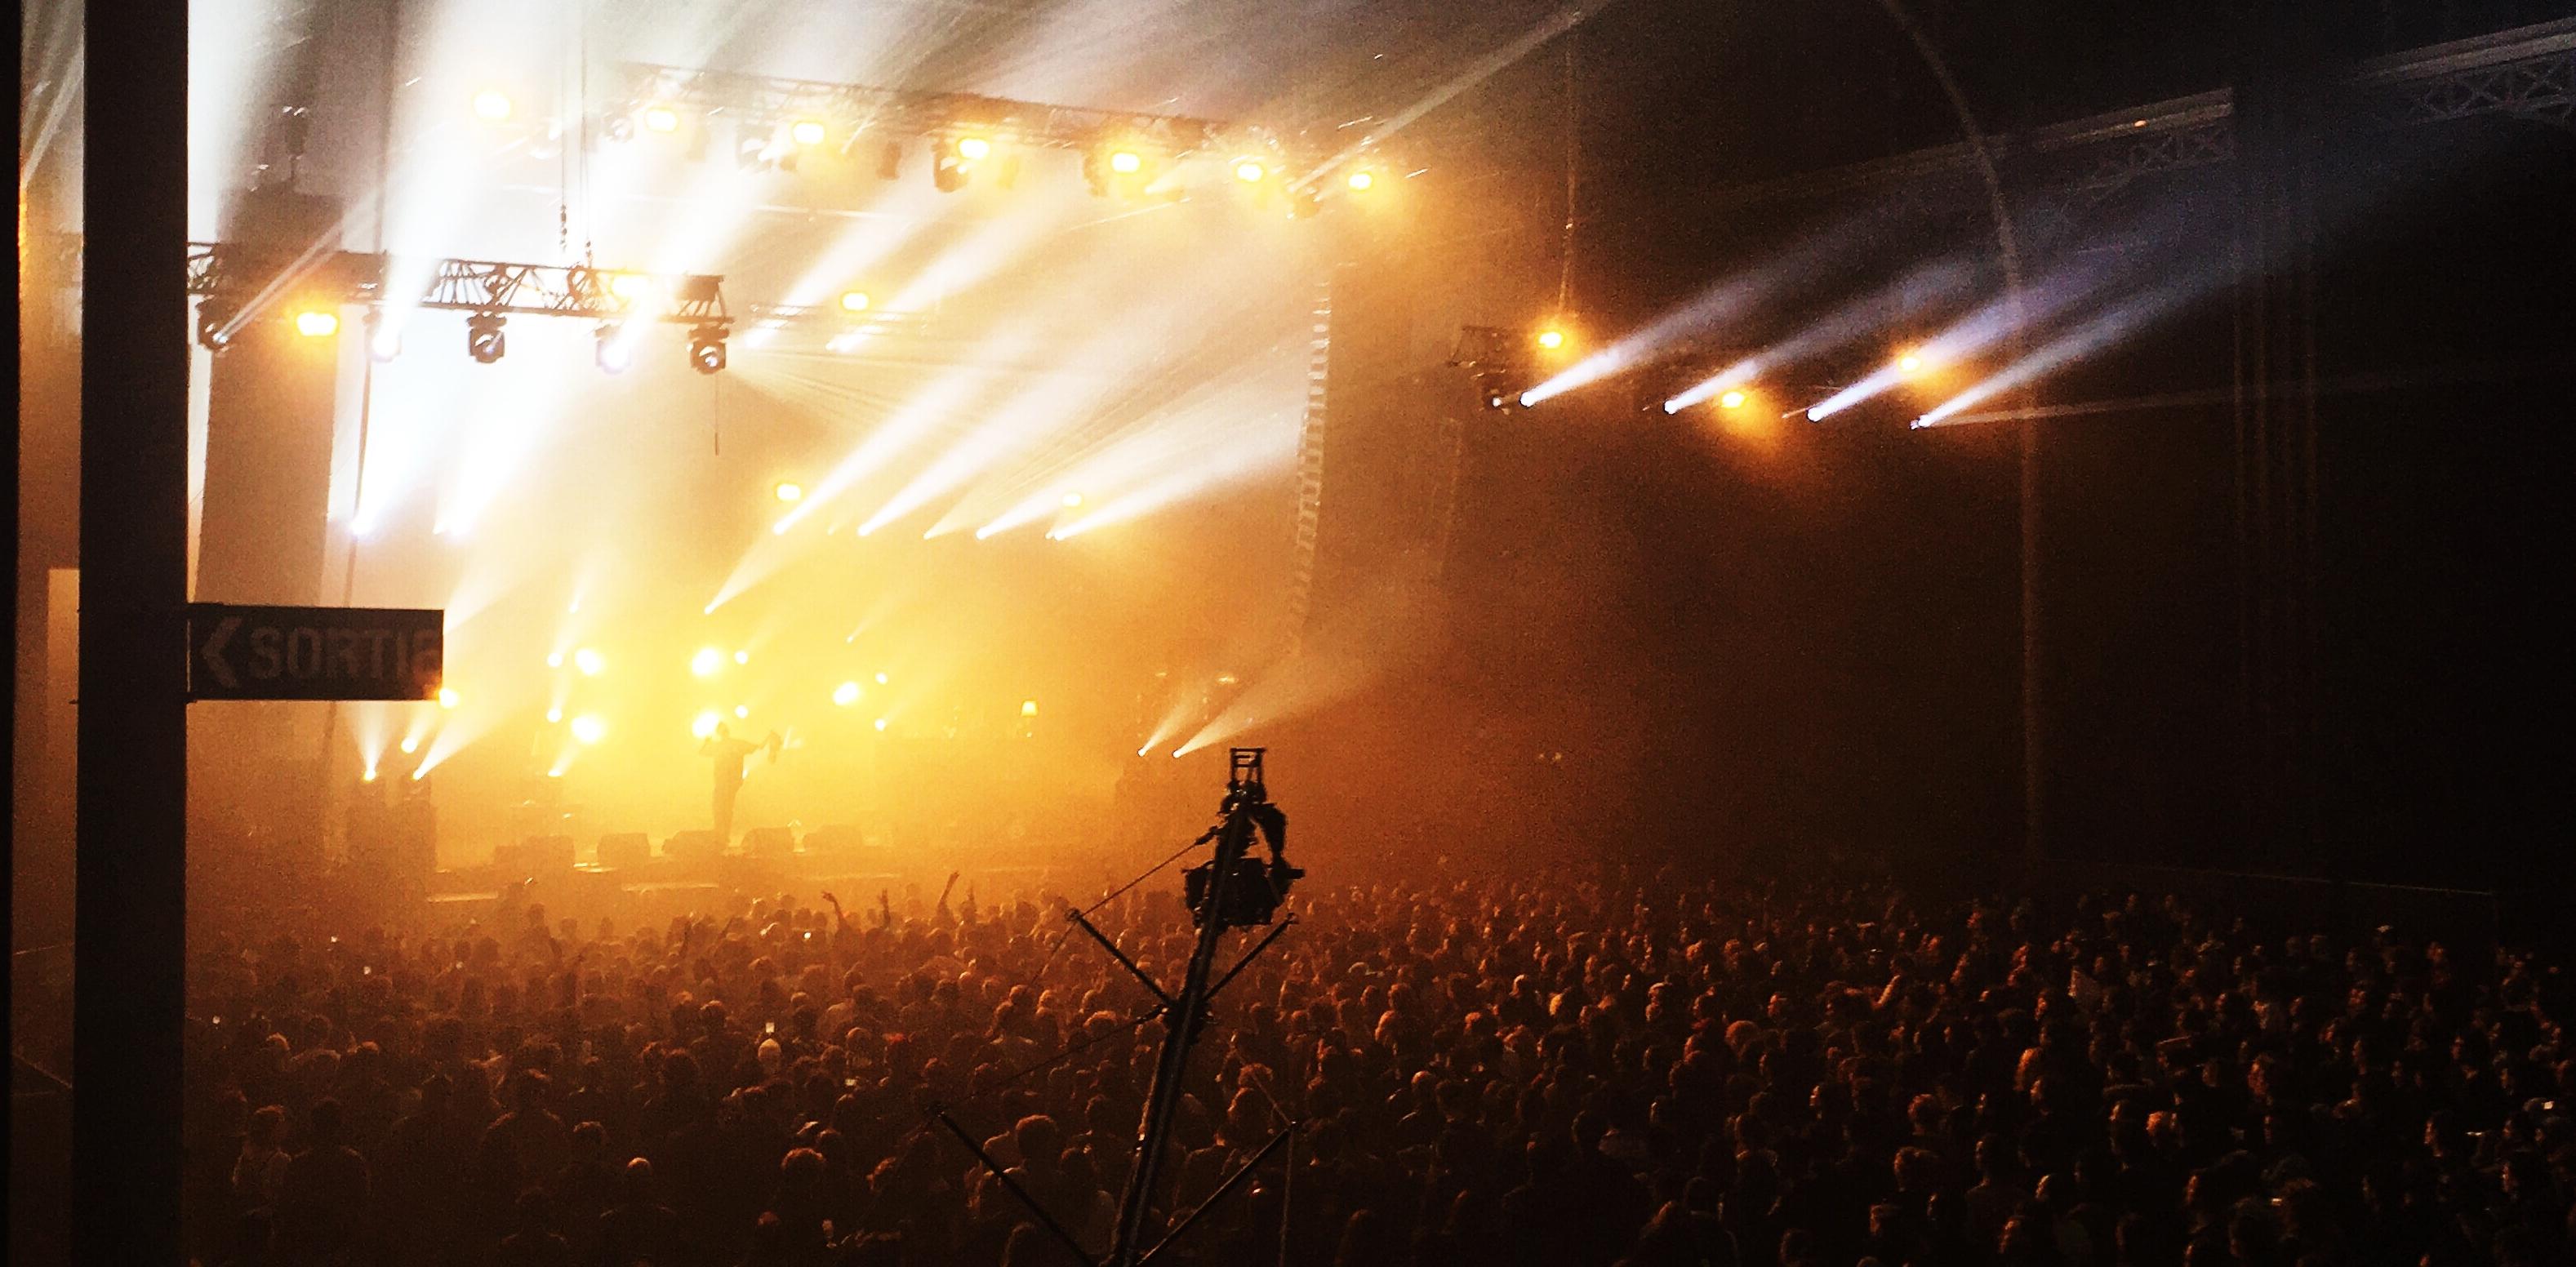 Pitchfork-Music-Festival-Paris-2019-e1572281825277